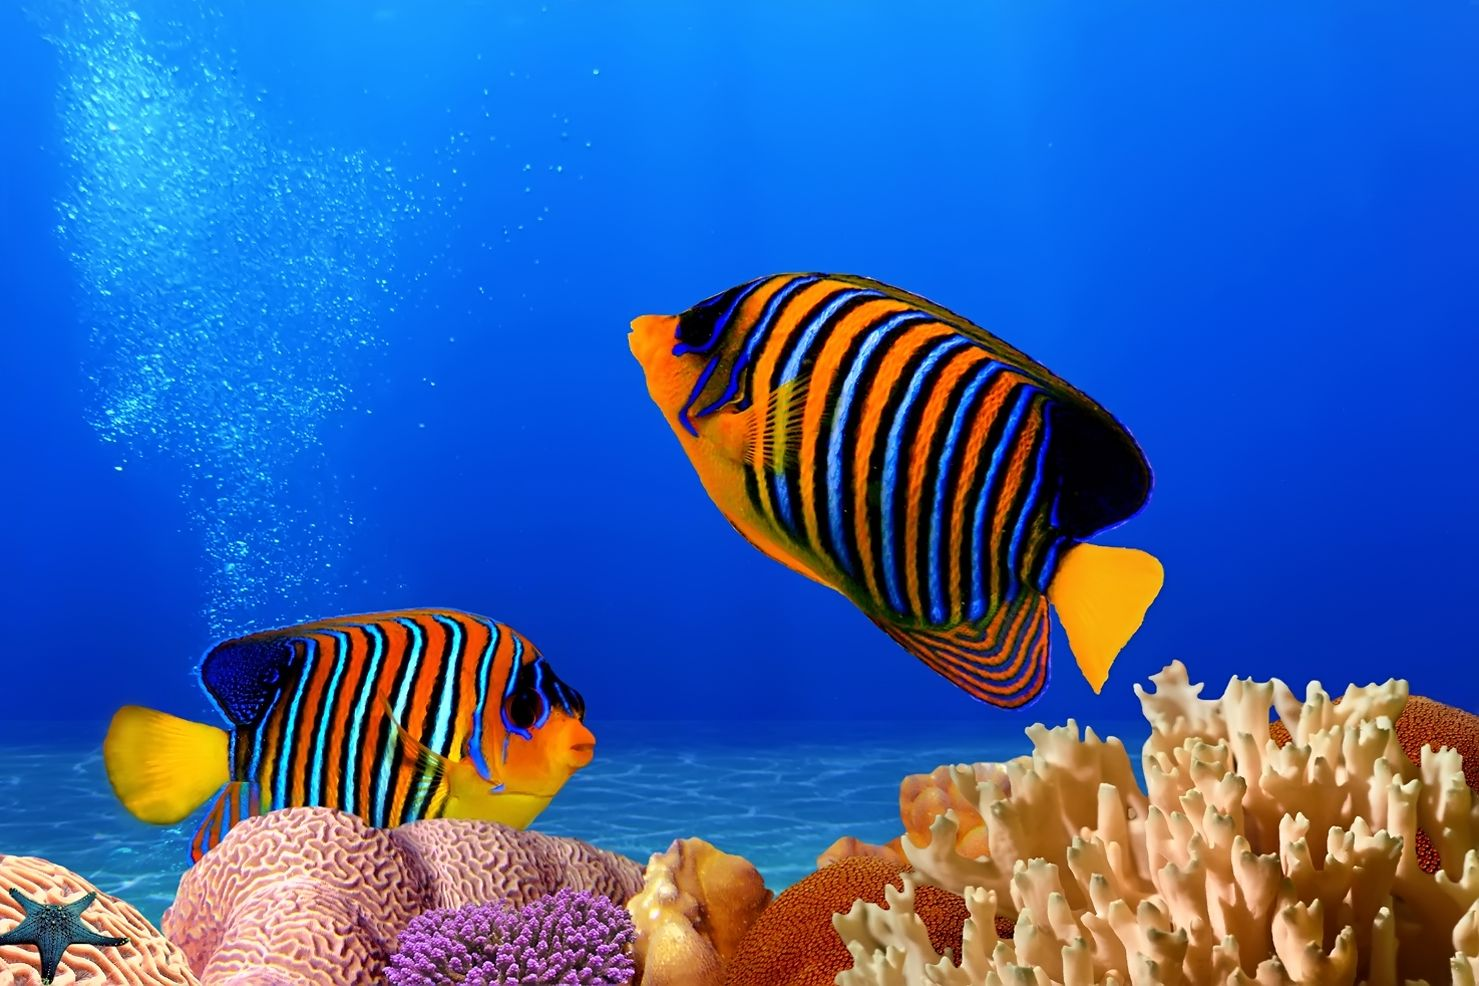 Top 20 Peces mas hermosos del mundo Taringa! - imagenes de peces de agua salada